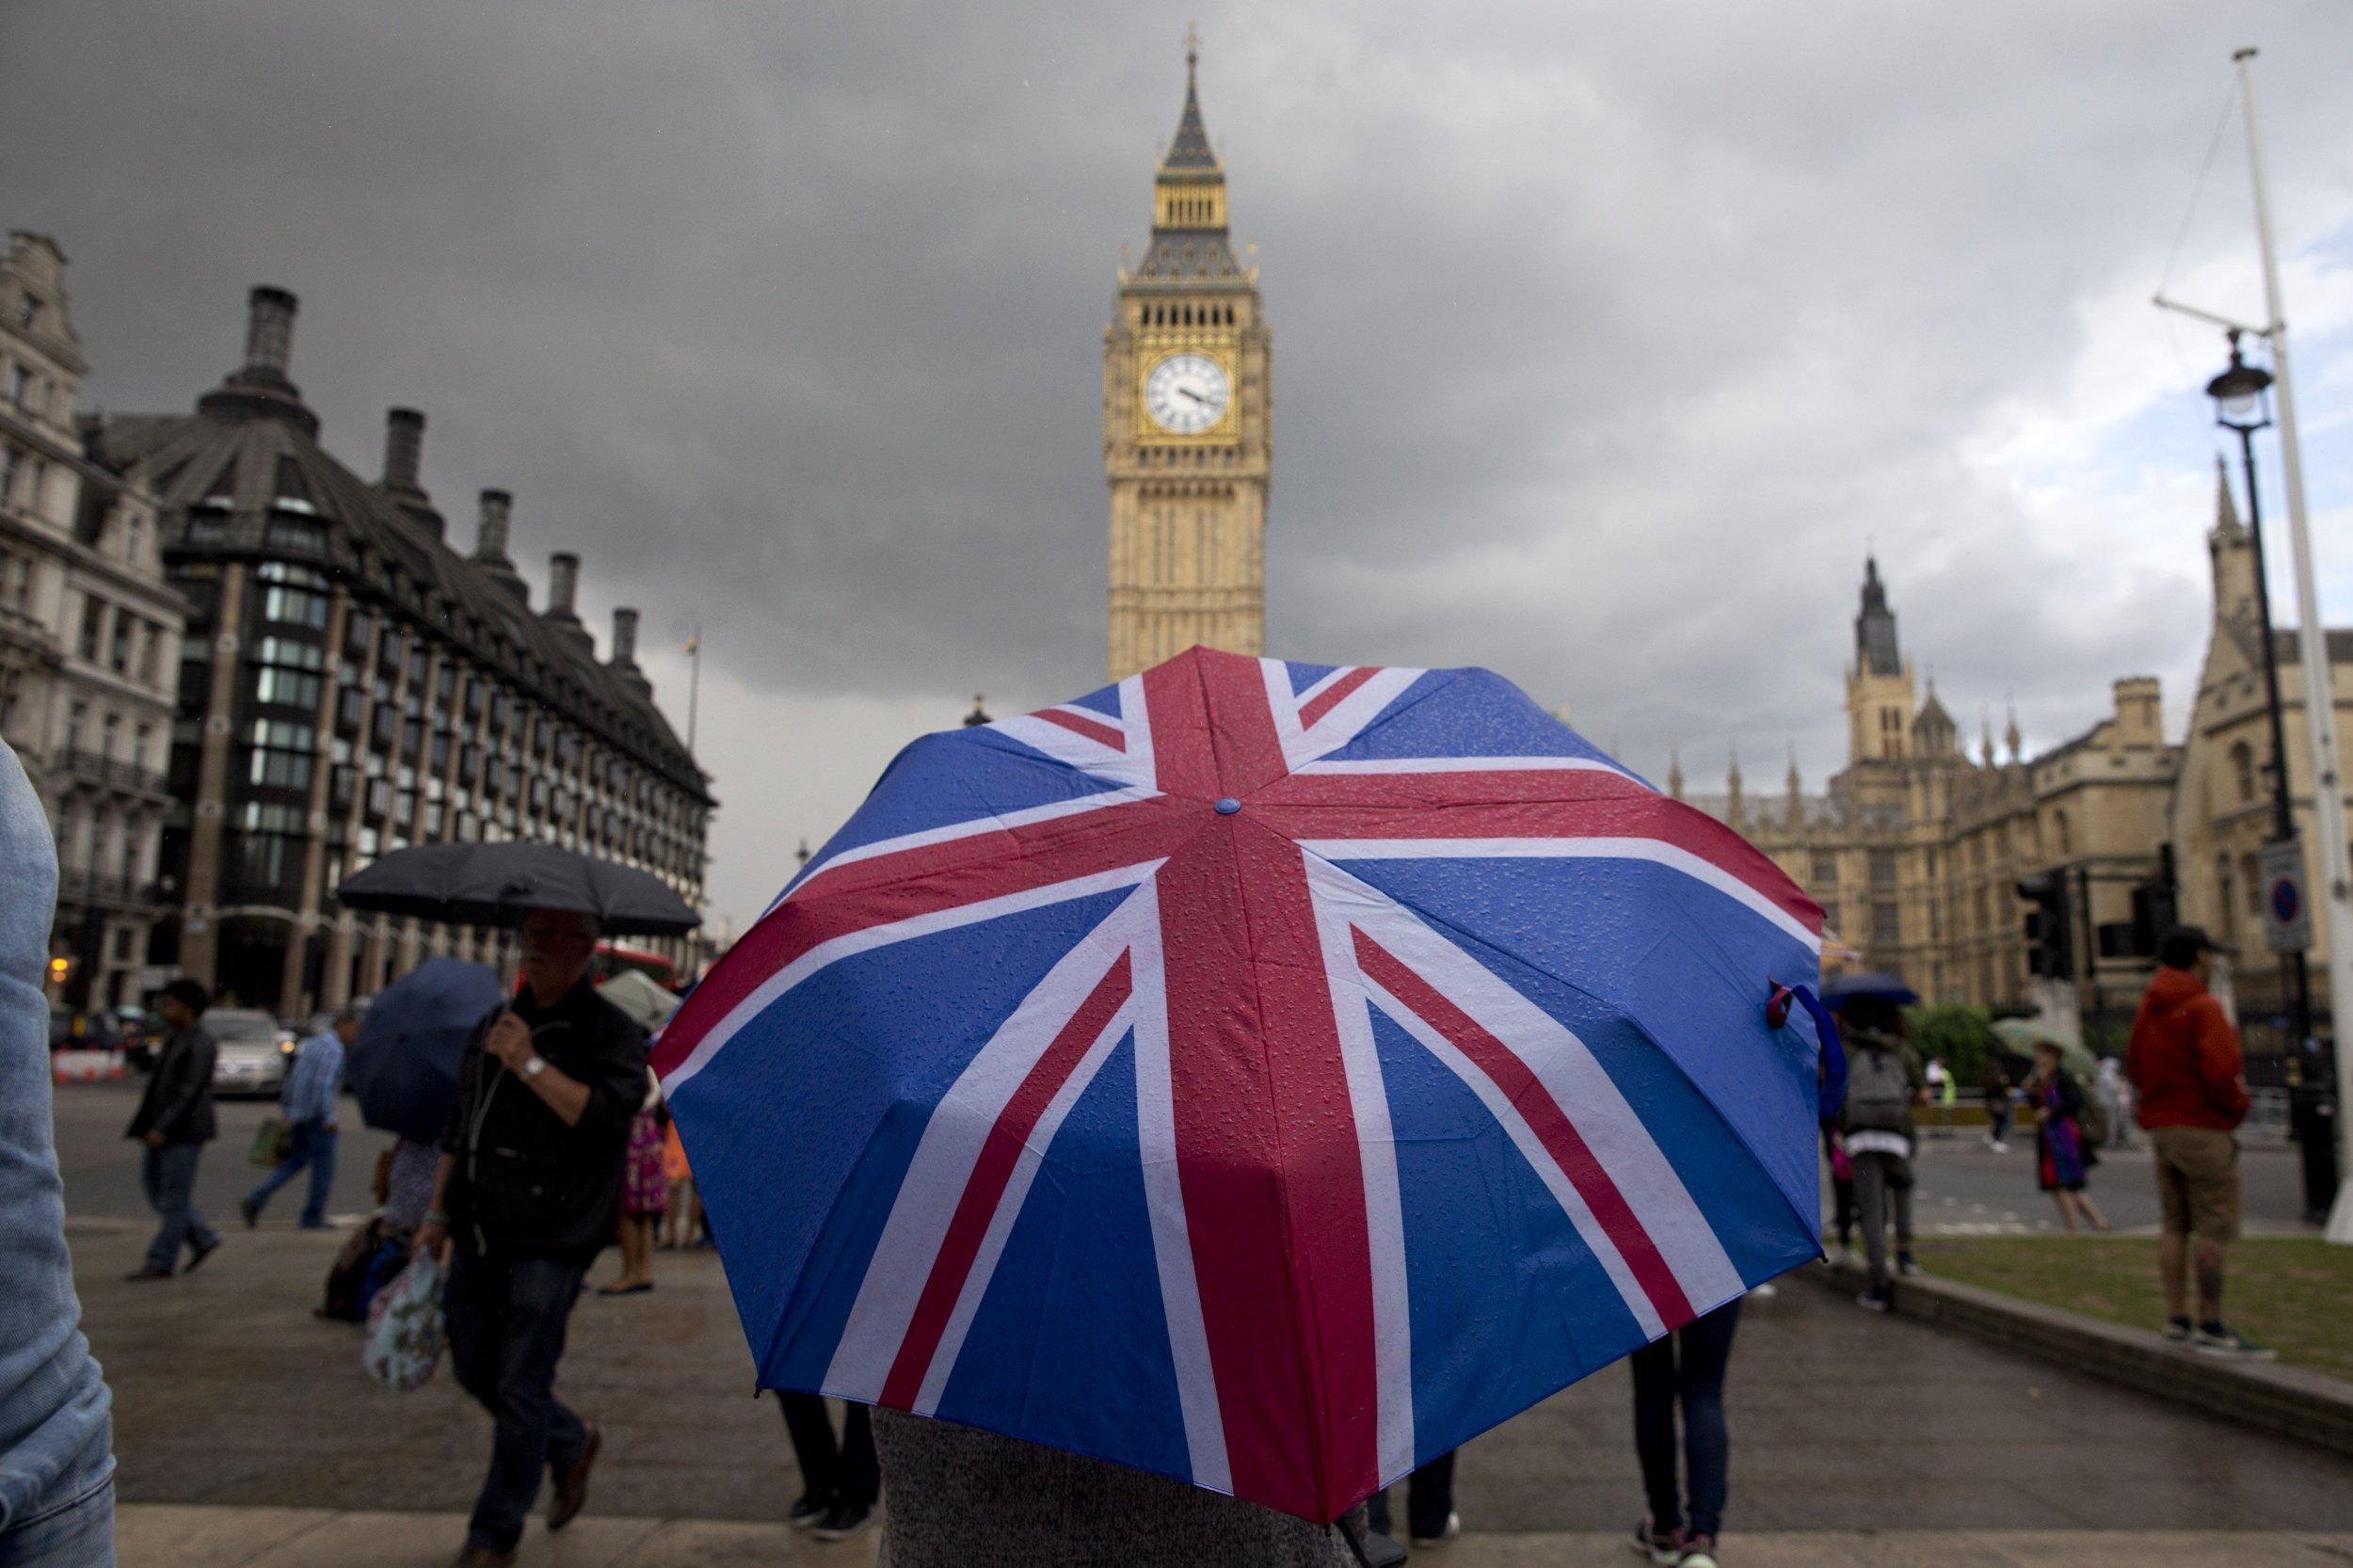 pedestrian-under-union-jack-umbrella Pentingnya Bahasa Inggris Demi Tuntutan Pekerjaan  wallpaper